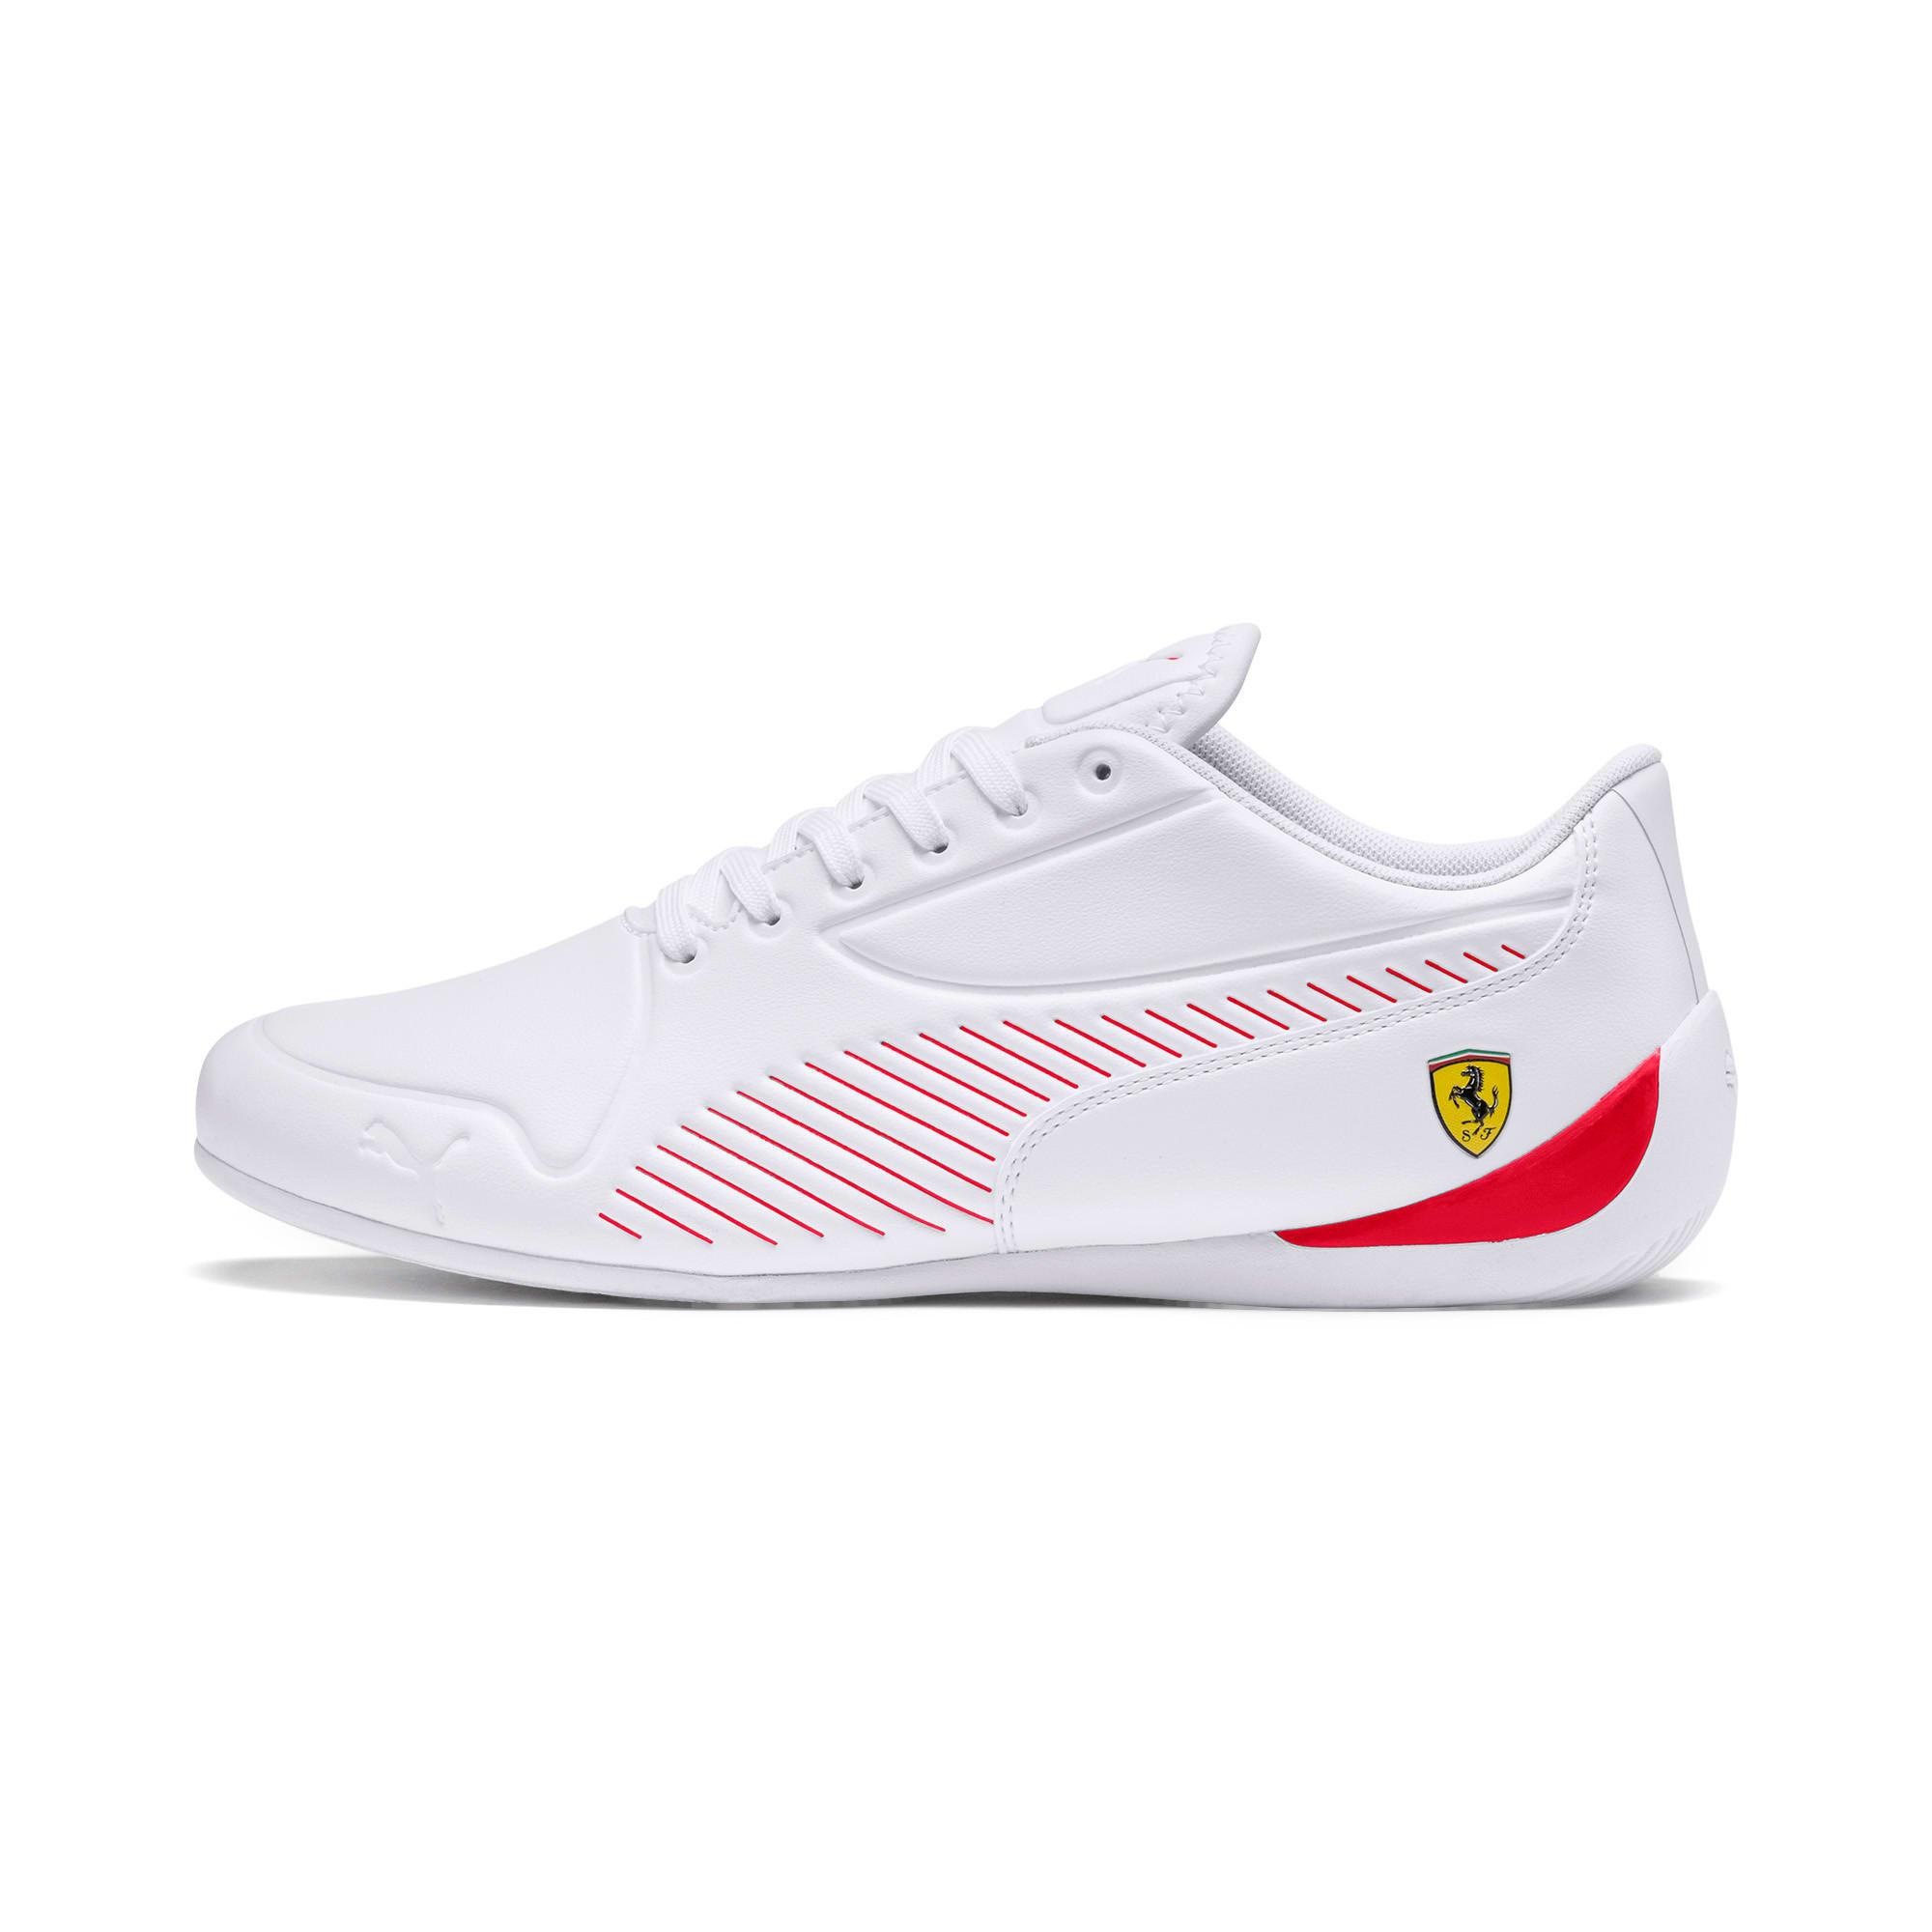 Thumbnail 1 of Ferrari Drift Cat 7S Ultra Men's Trainers, Puma White-Rosso Corsa, medium-IND